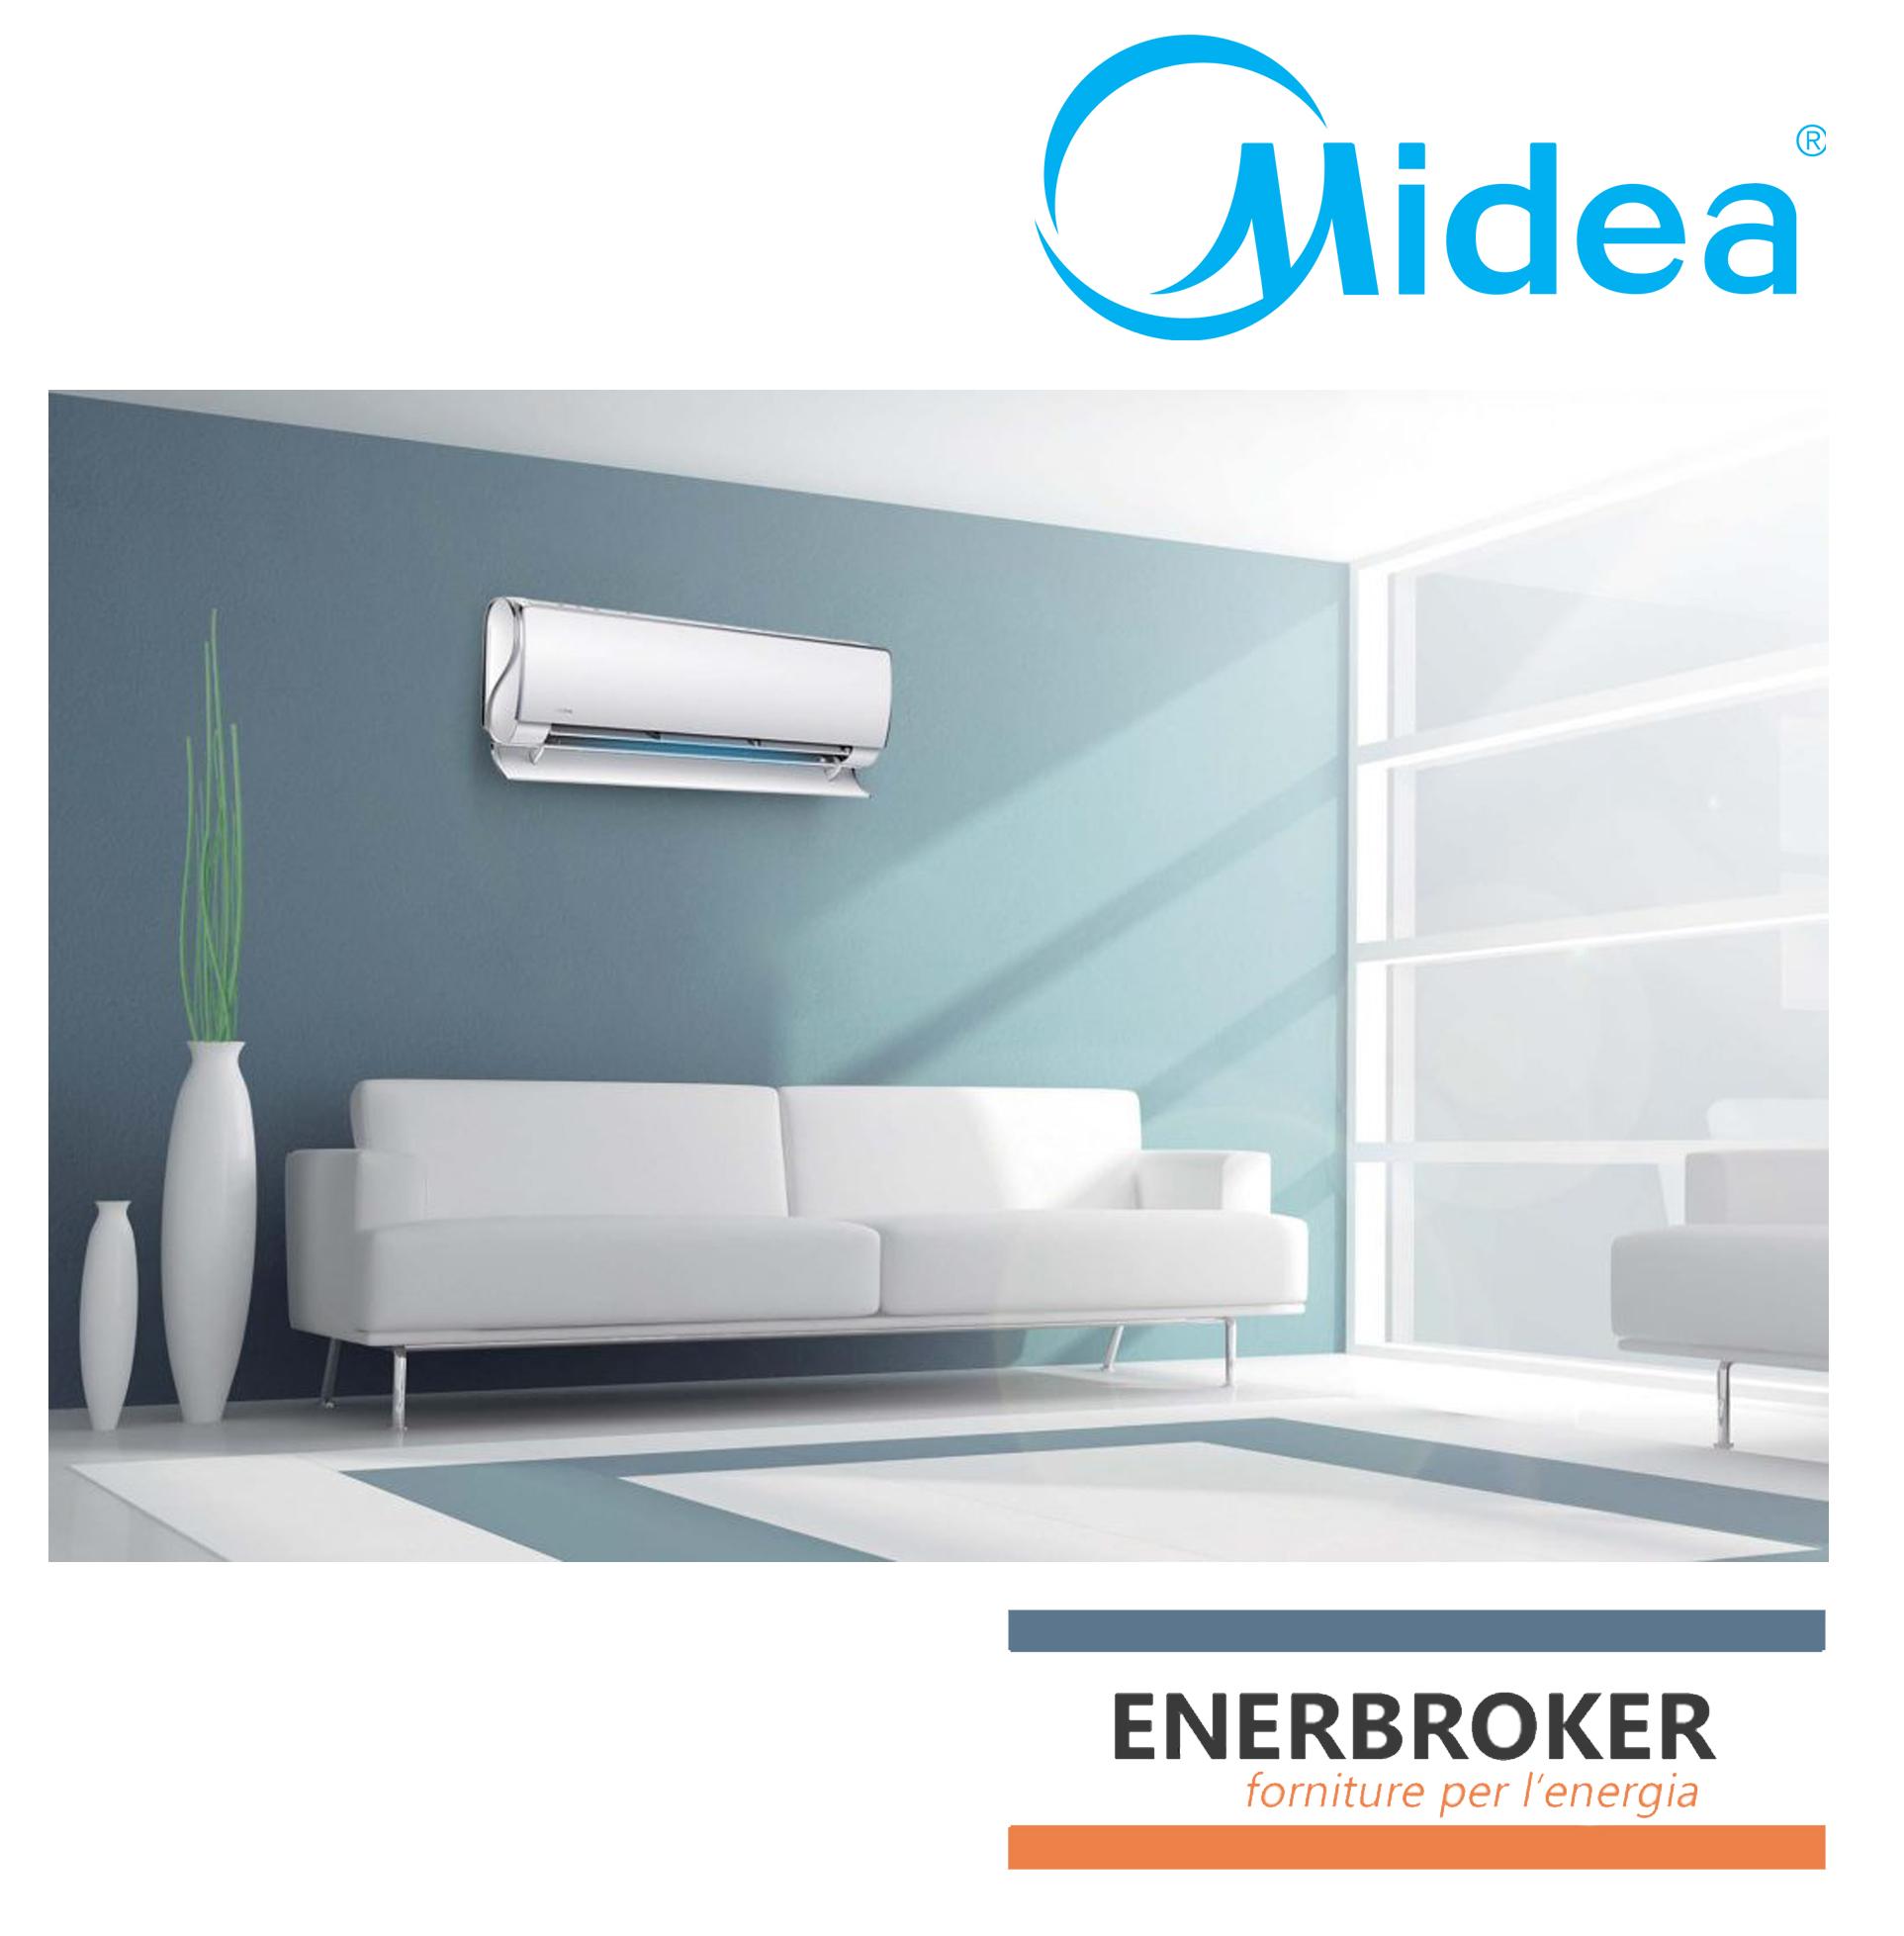 EnerBroker-Midea: nuova partnership commerciale